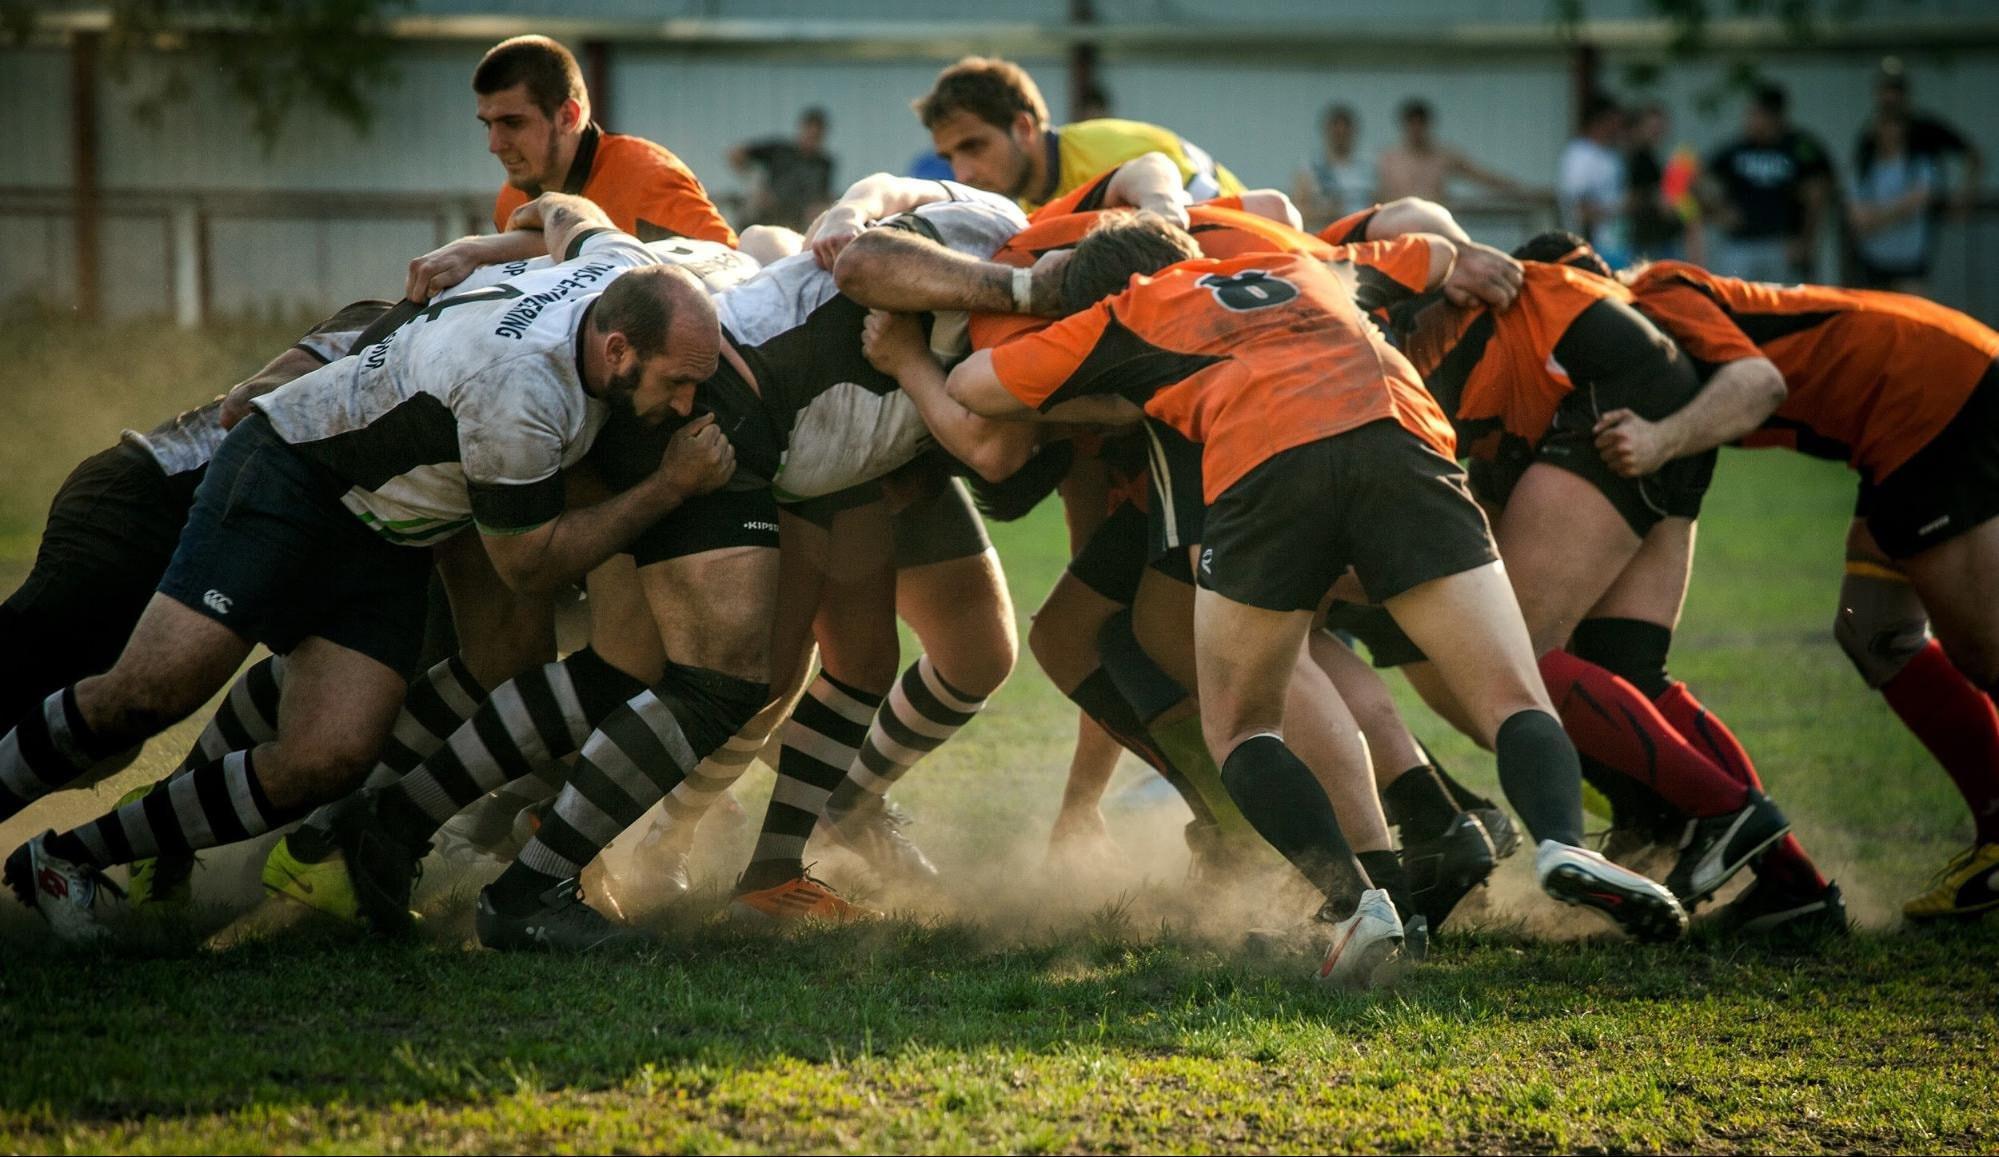 sports-photography-olga-guryanova